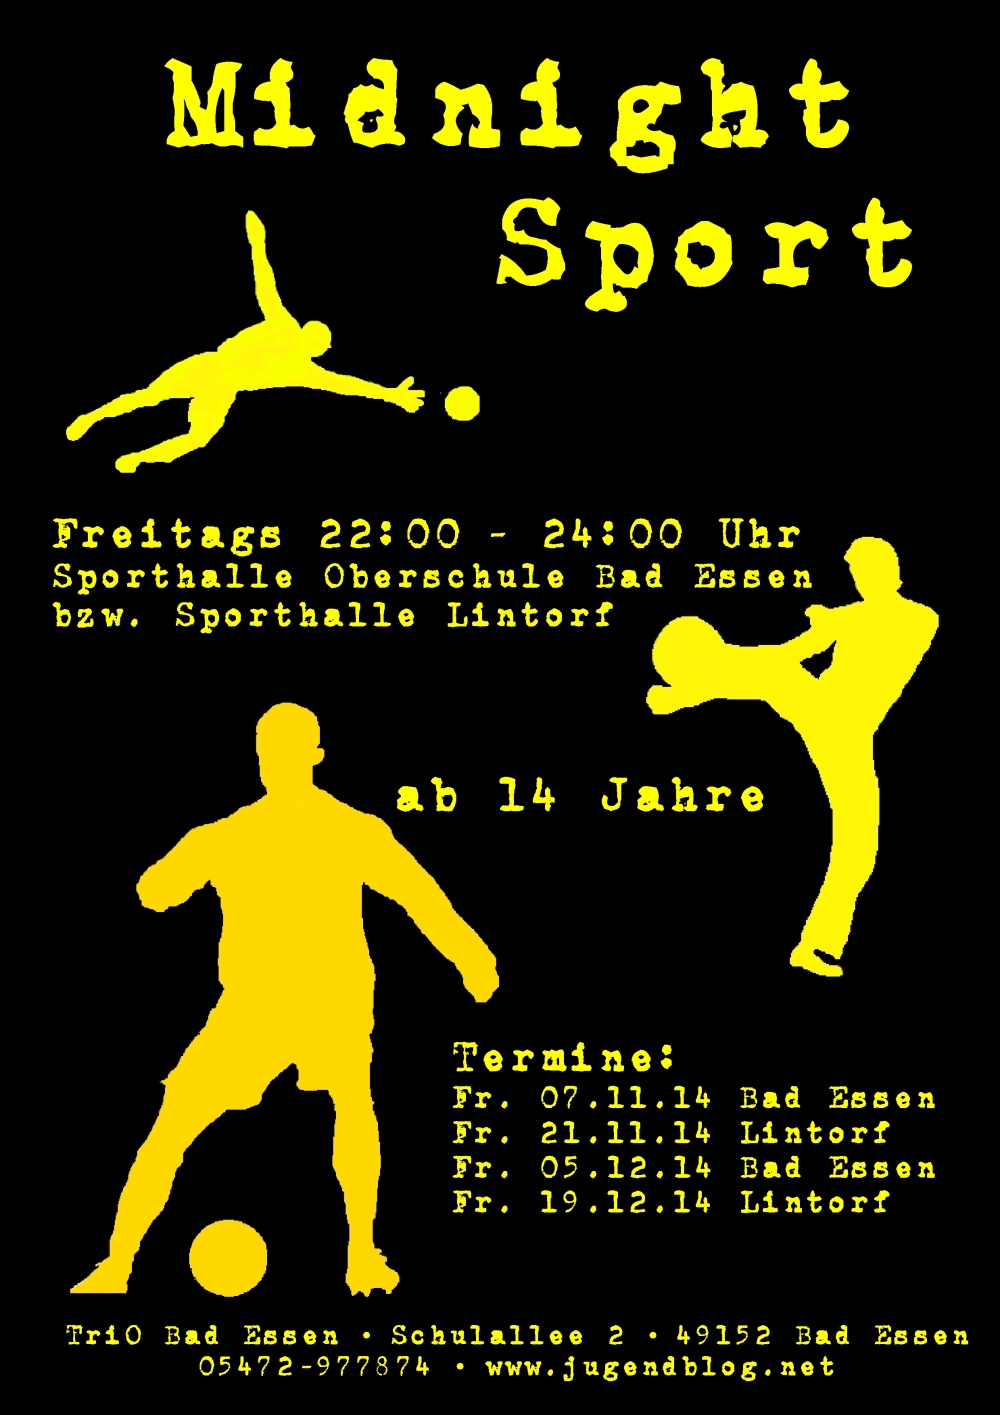 Plakat - Midnight Sport Okt-Dez 2014